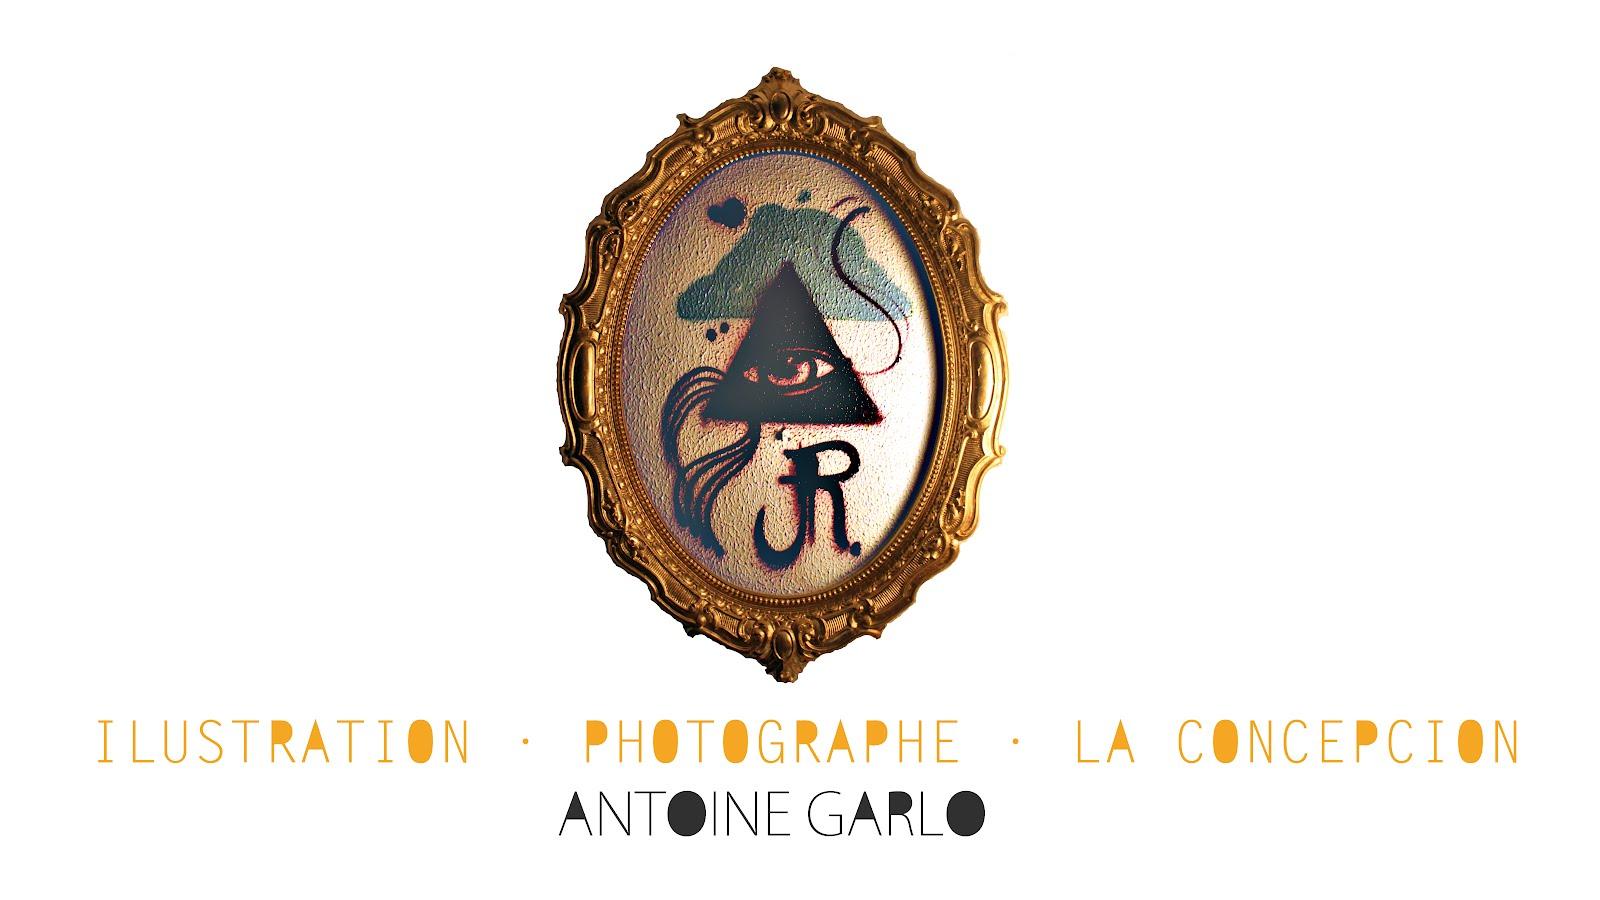 Antoine Garlo